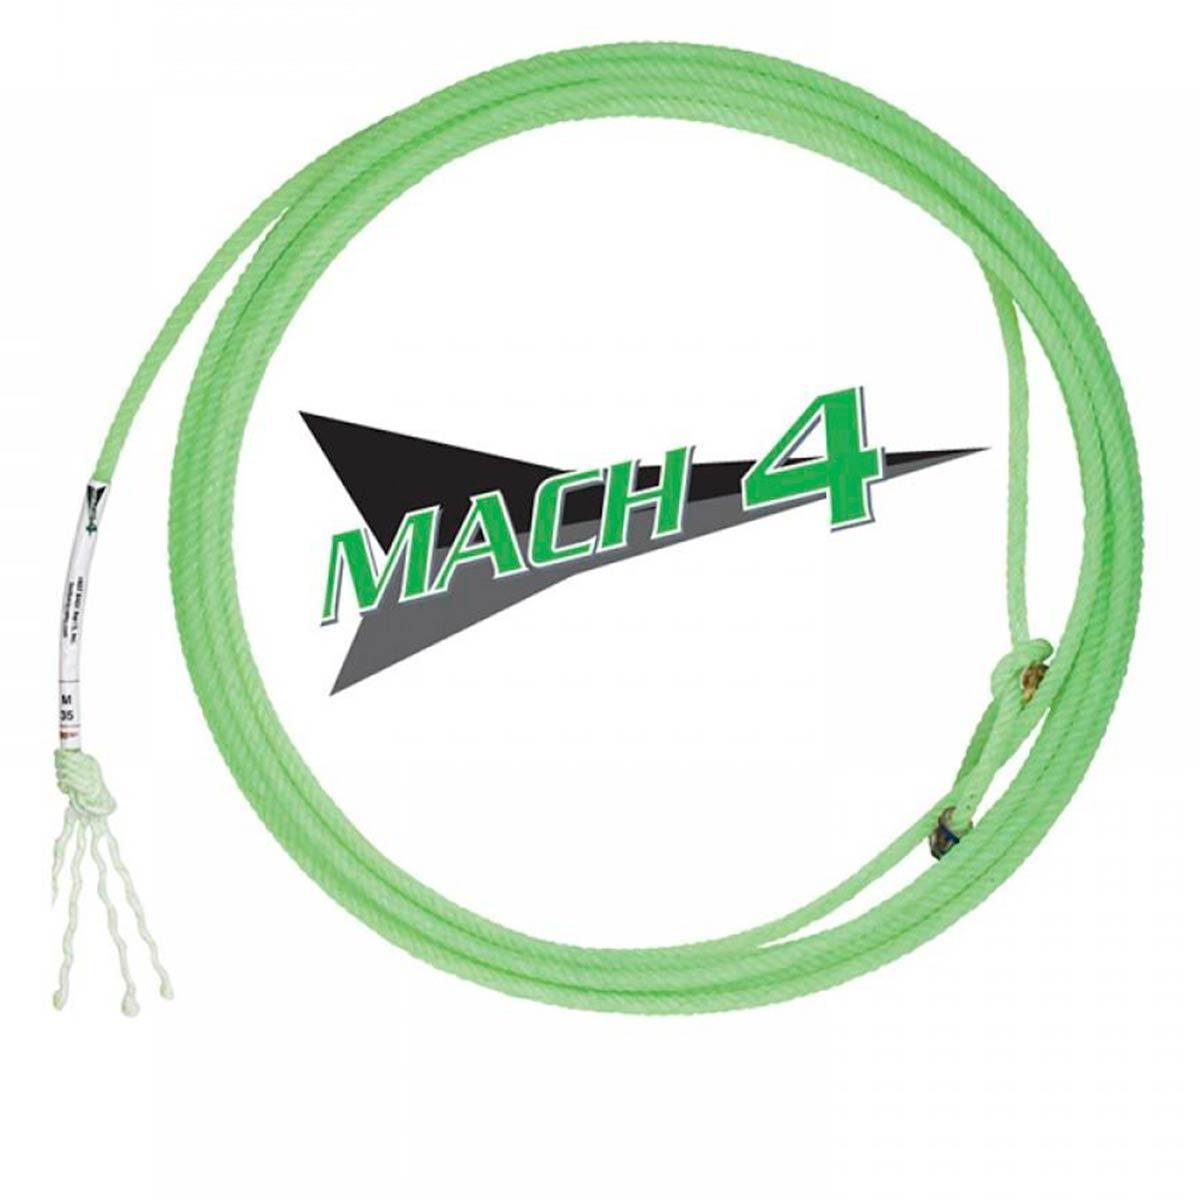 Corda Laço Fast Back Mach 4 Tentos Para Team Roping